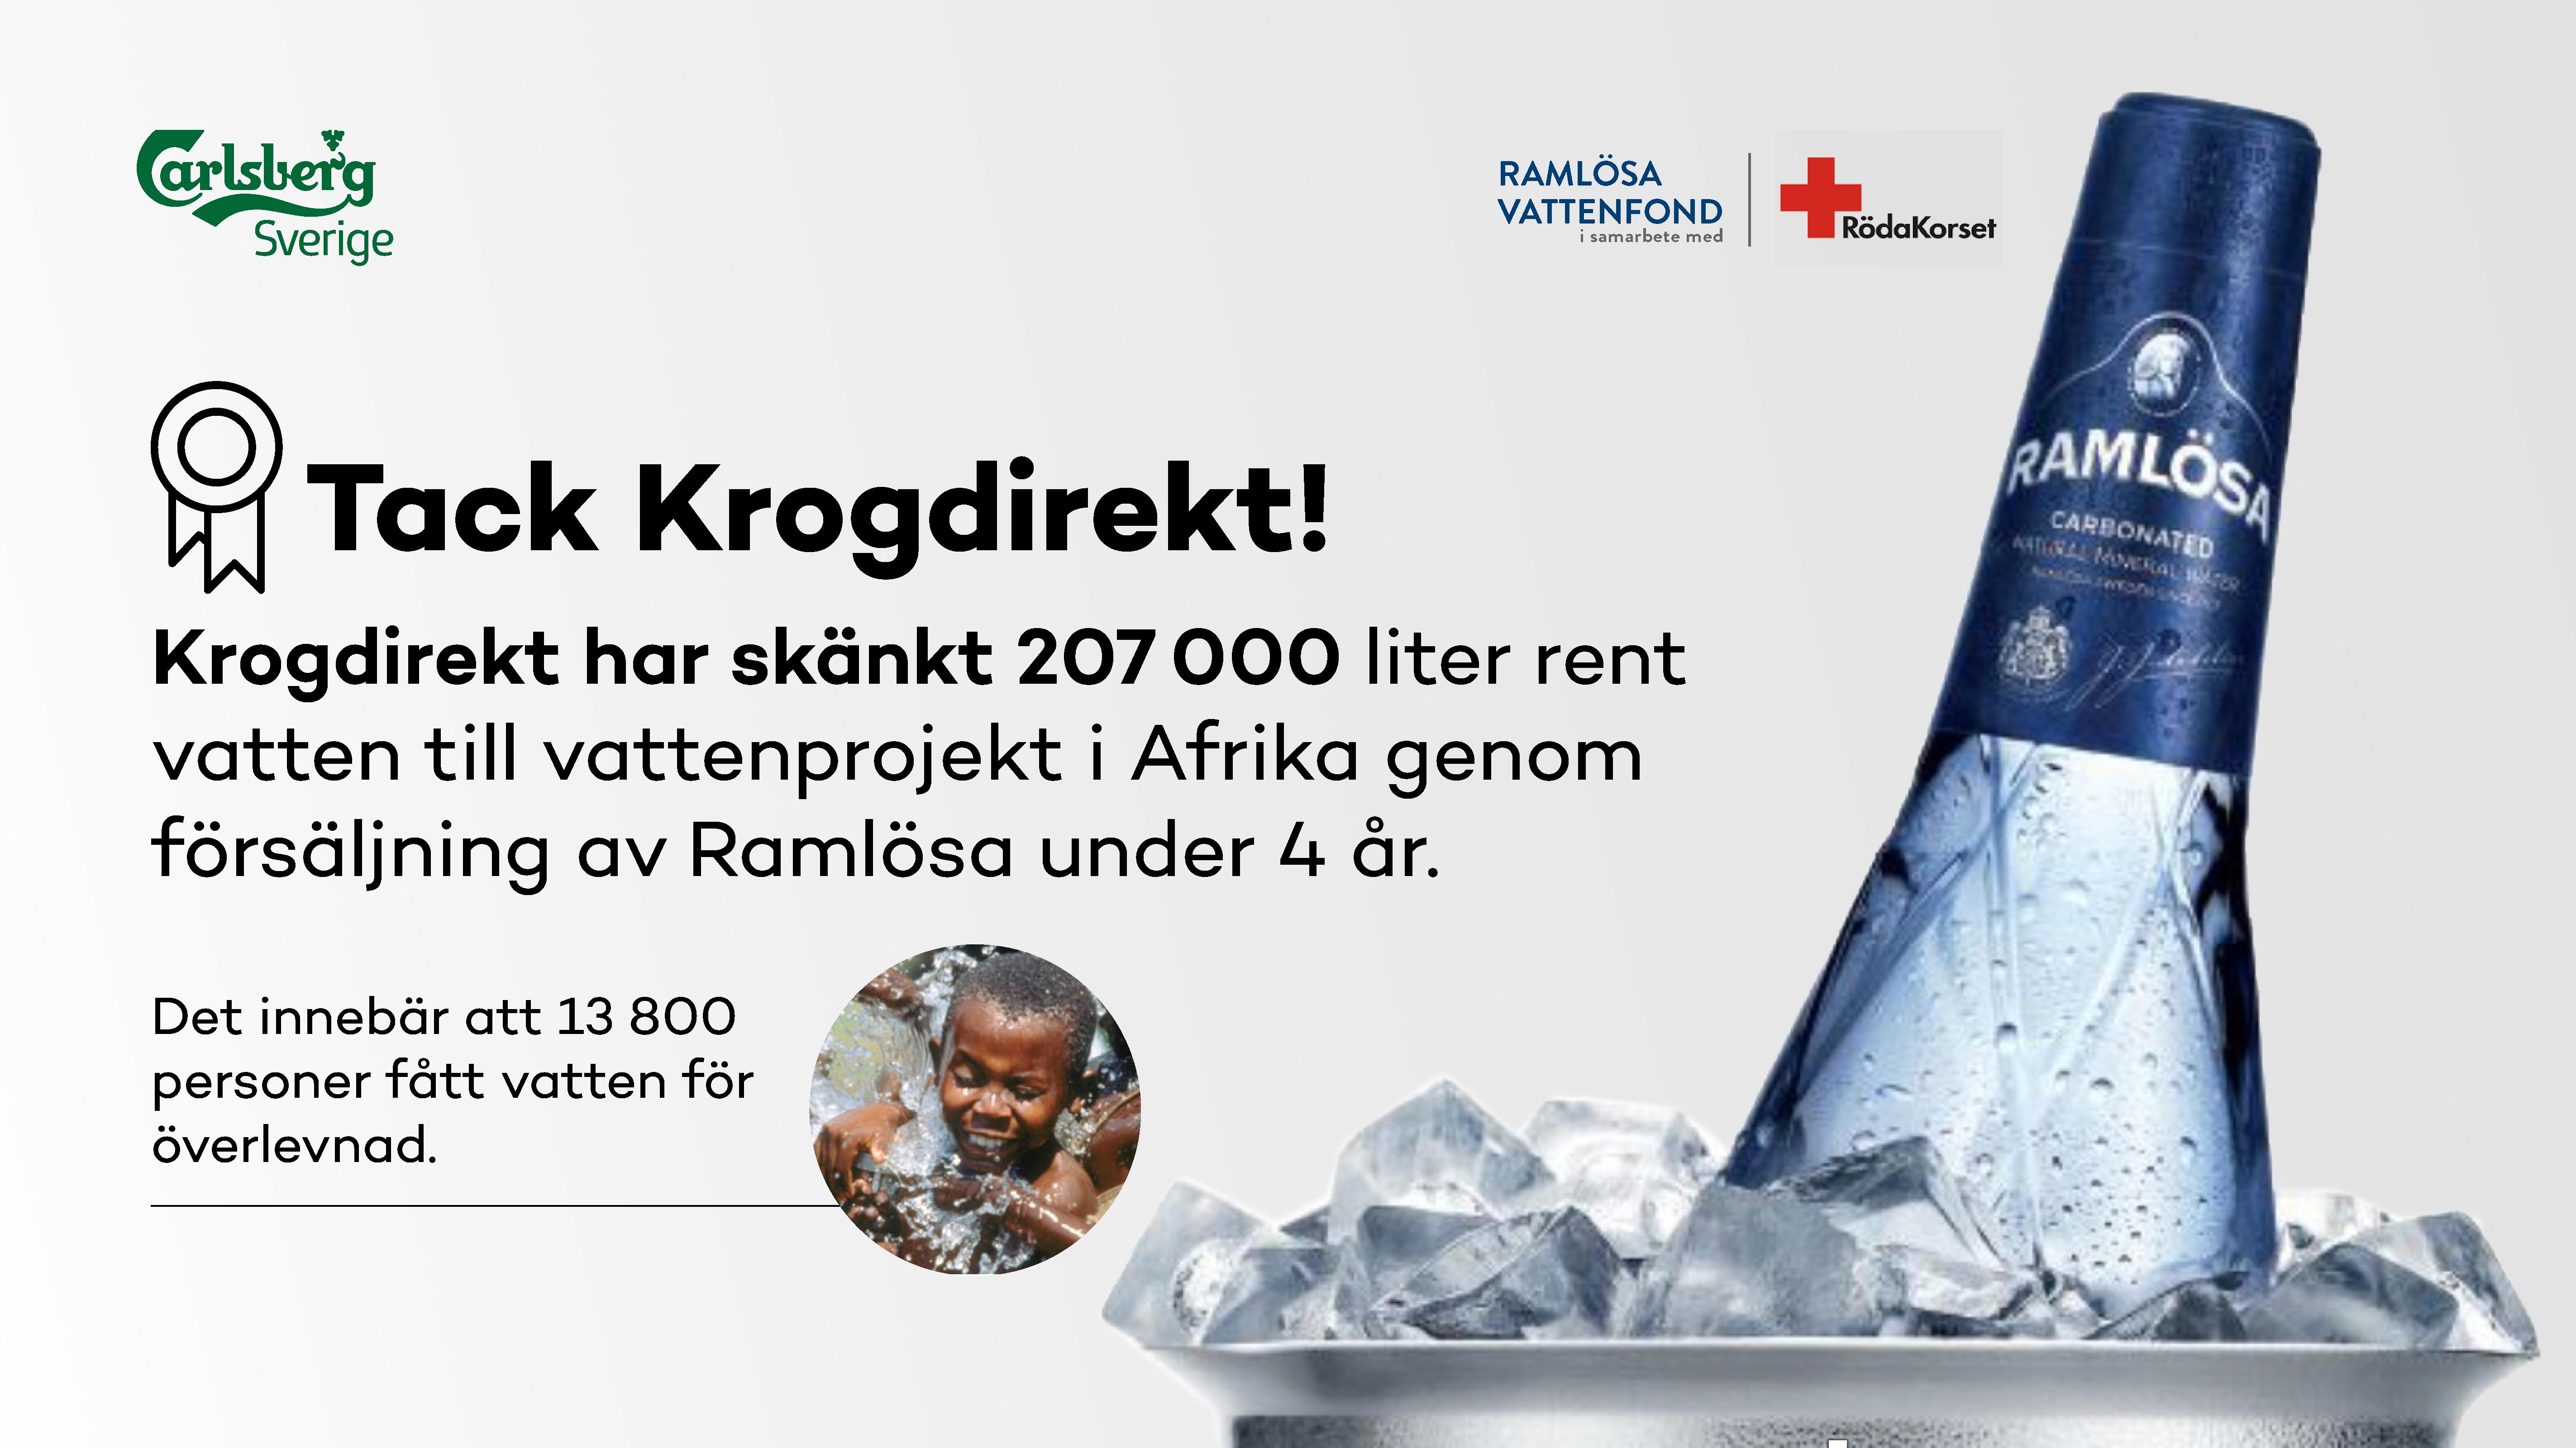 Ramlösa Vattenfond